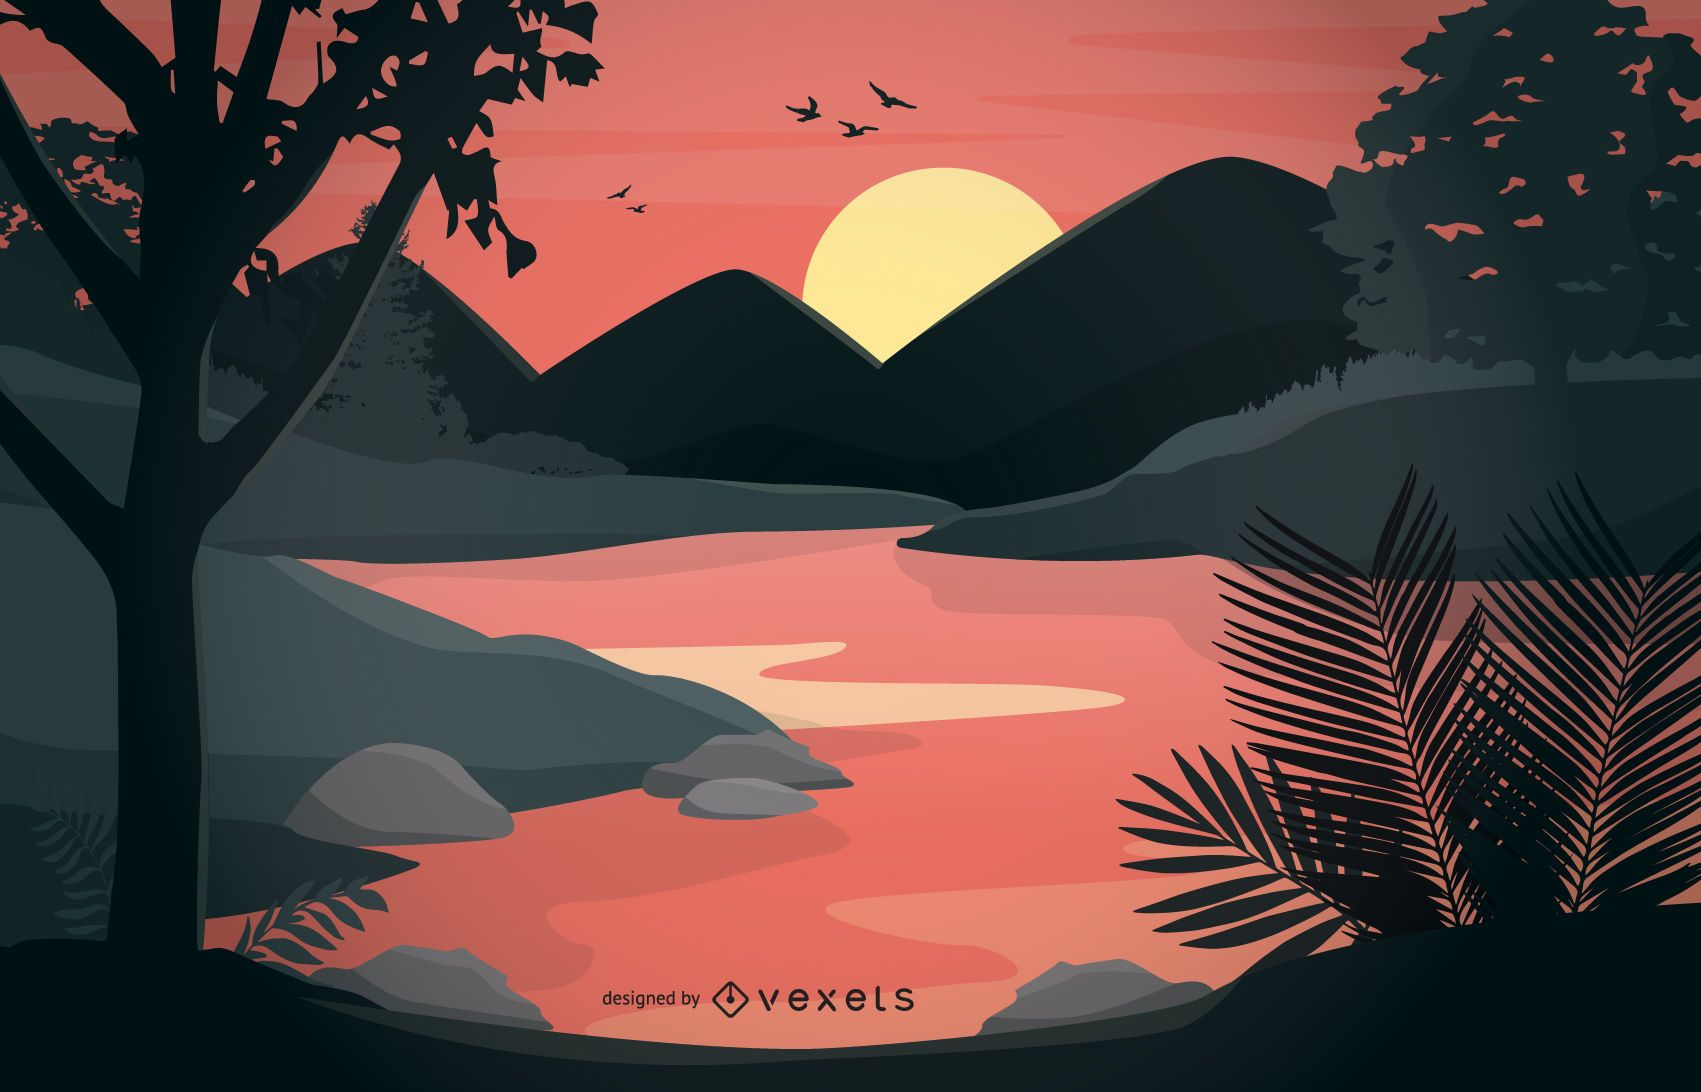 Paisaje de dibujos animados de Forest Side River - Descargar vector